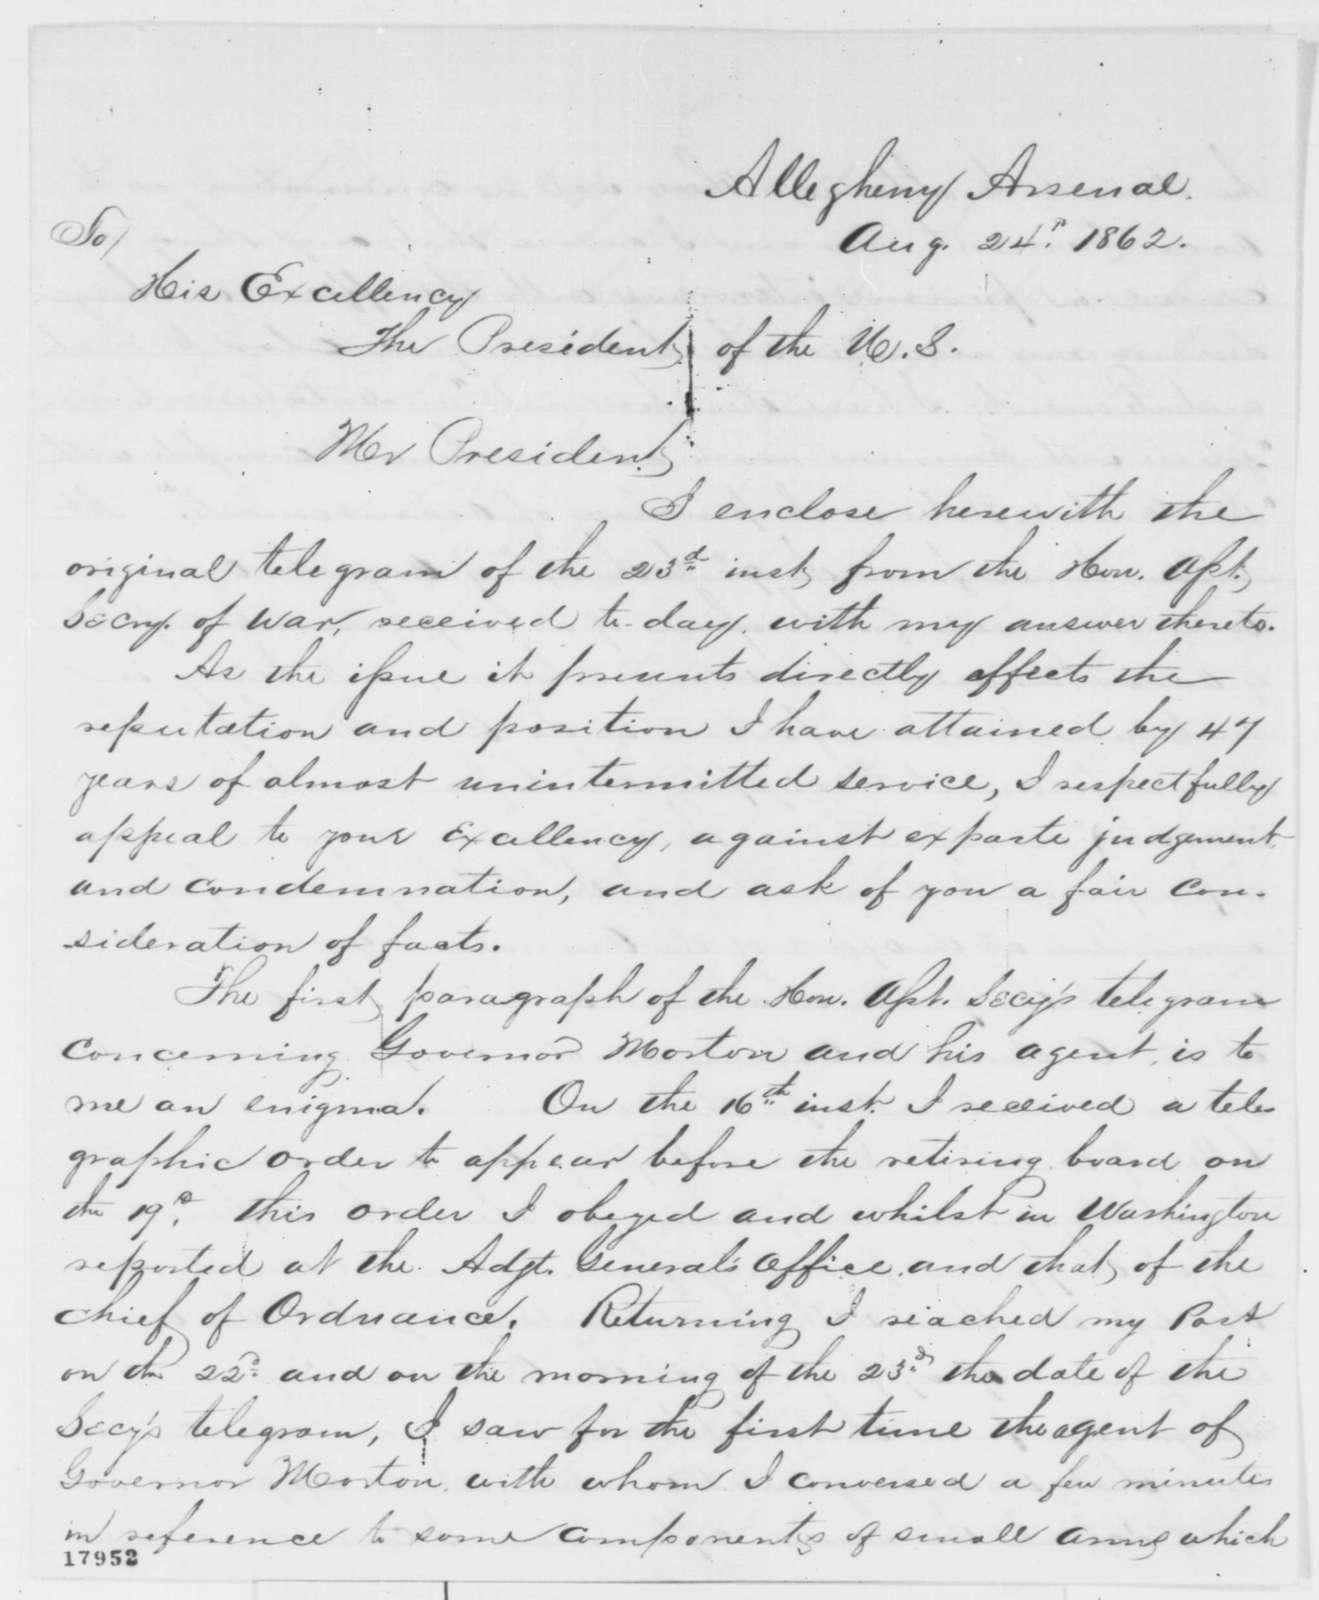 John Symington to Abraham Lincoln, Sunday, August 24, 1862  (Military affairs)